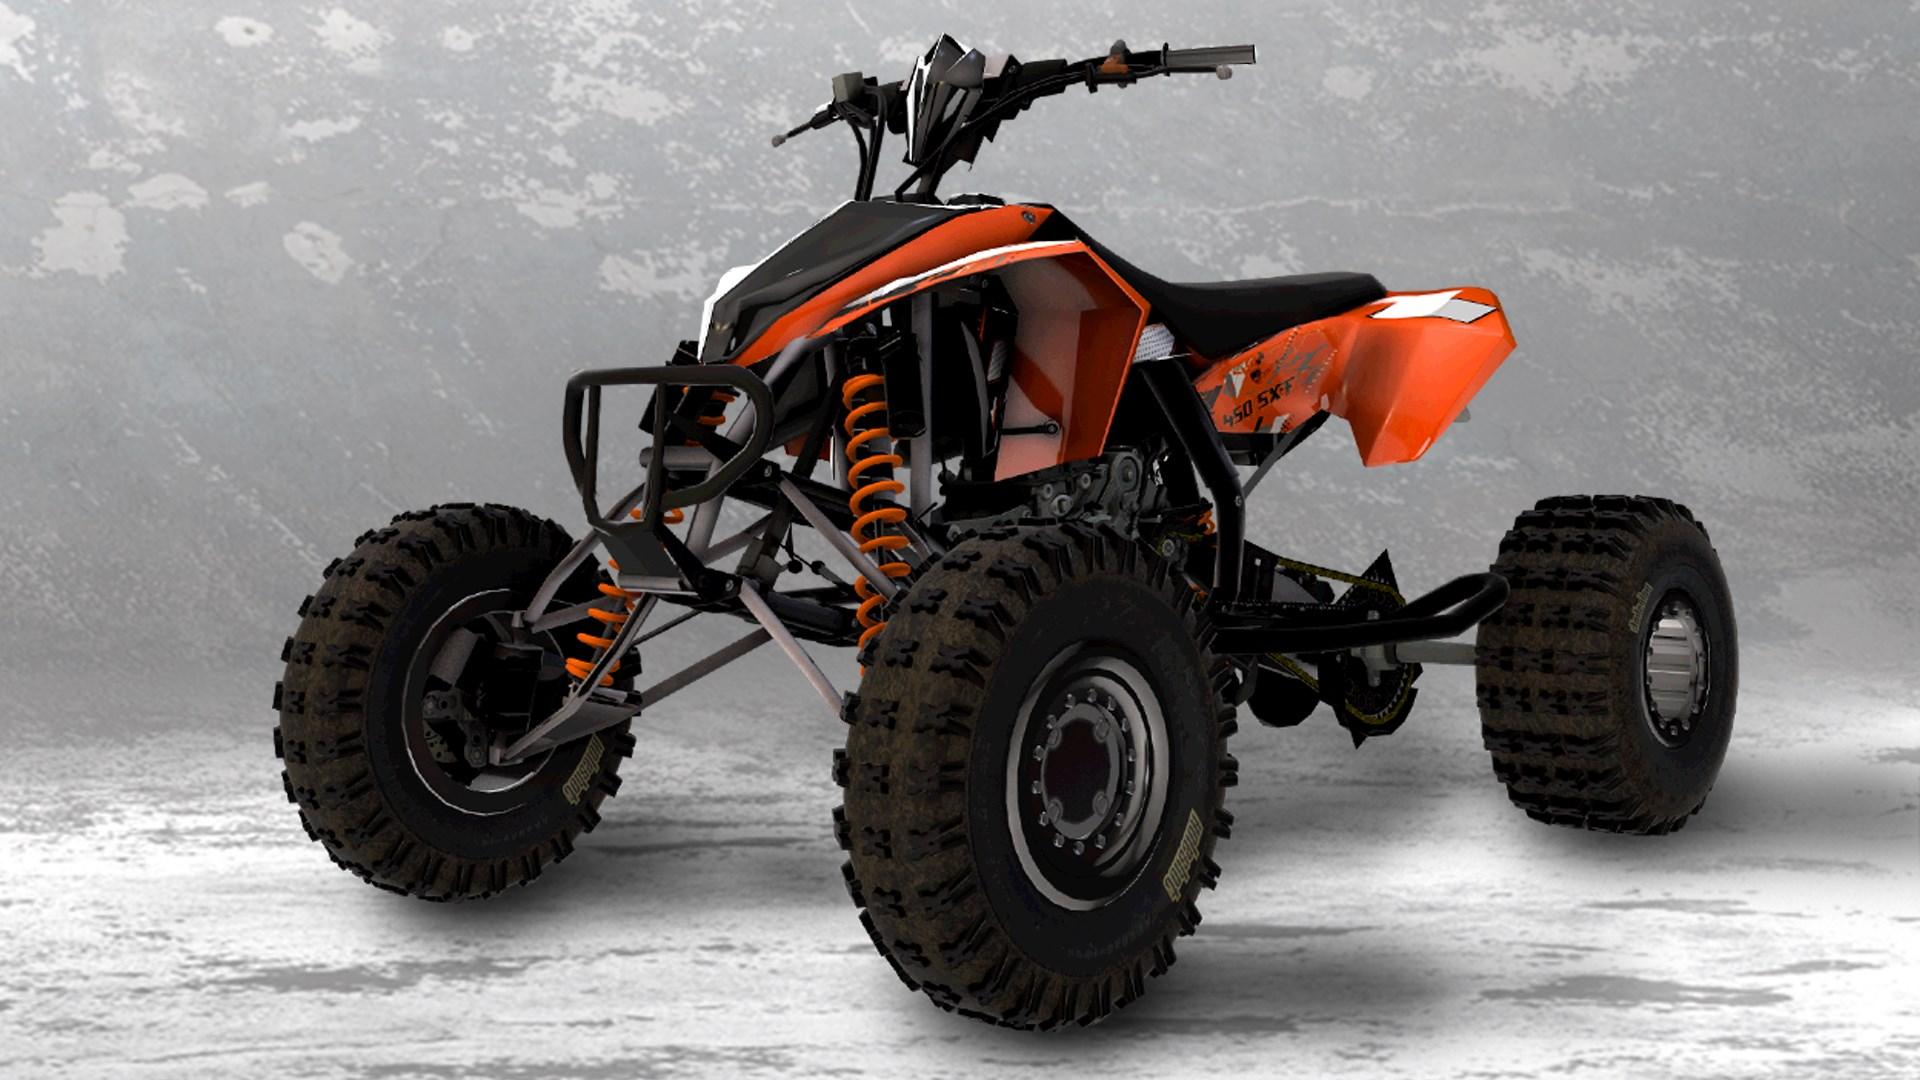 2011 KTM 450 SX ATV